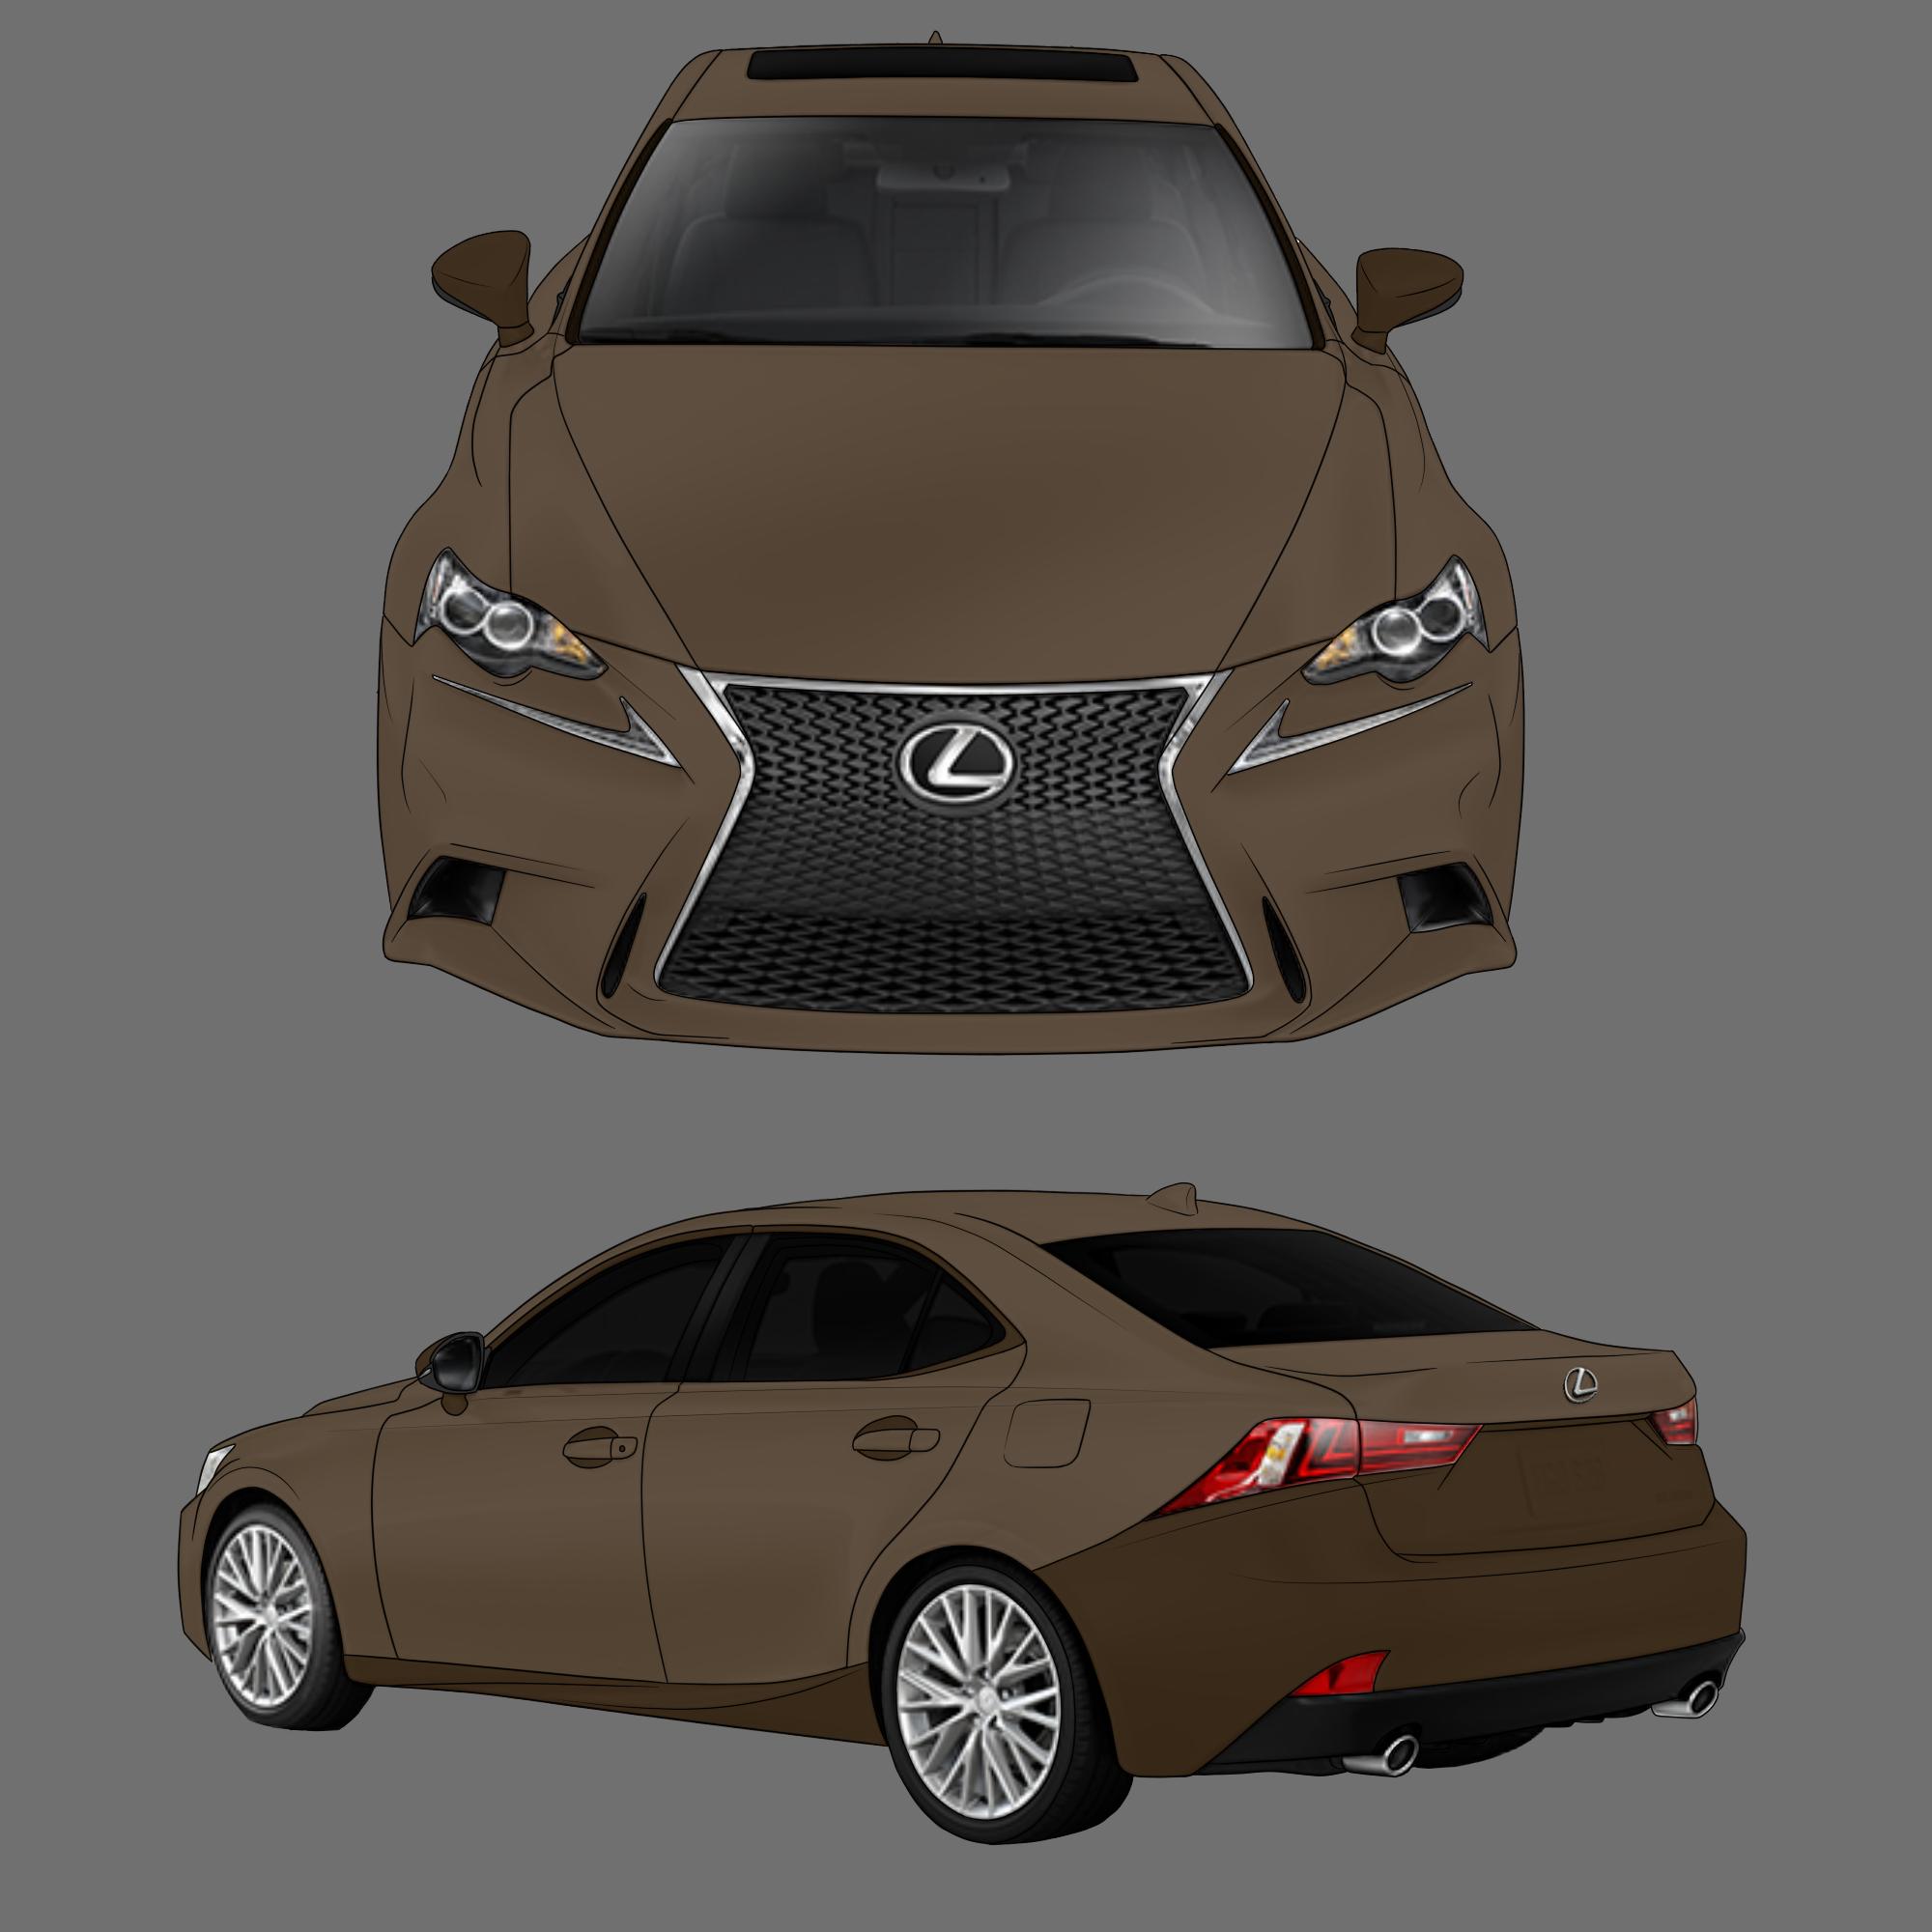 Lexus F-Sport by Sushiopolis